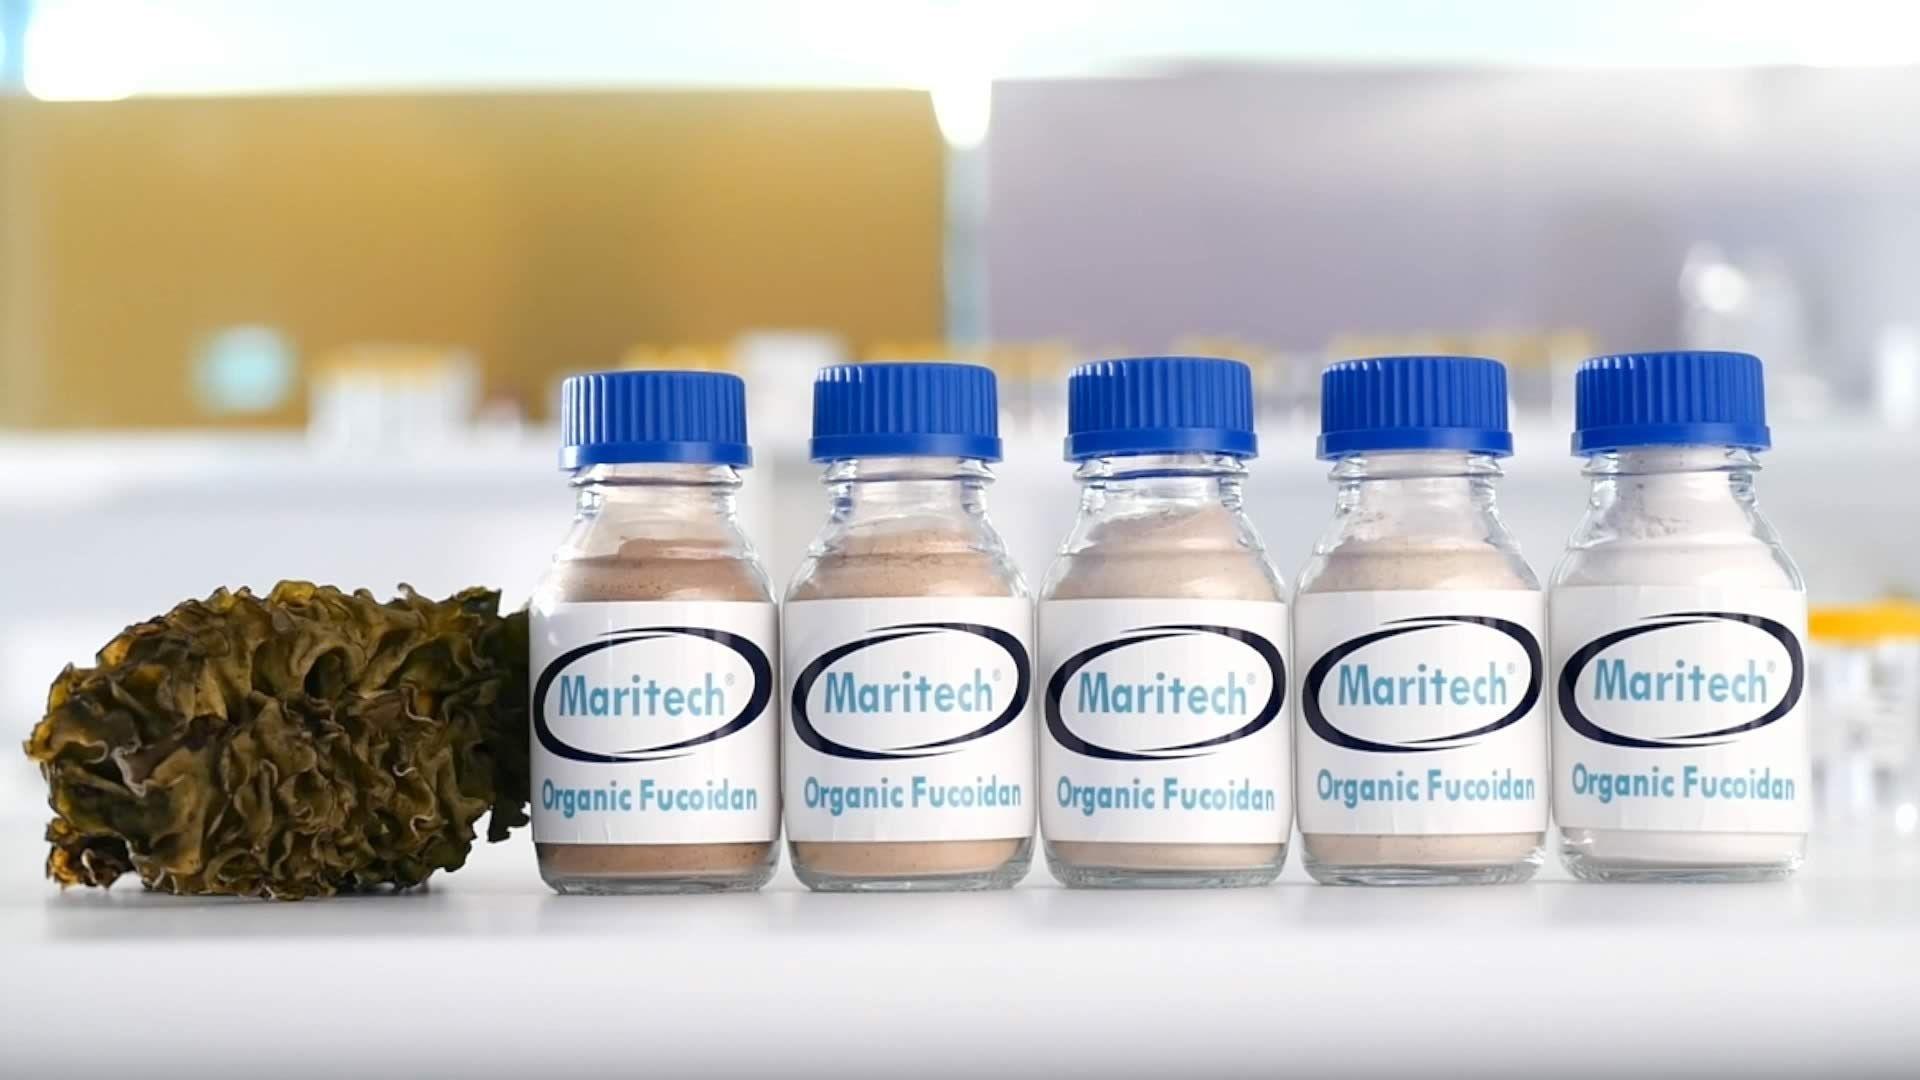 Marintech Organic Fucoidan powder